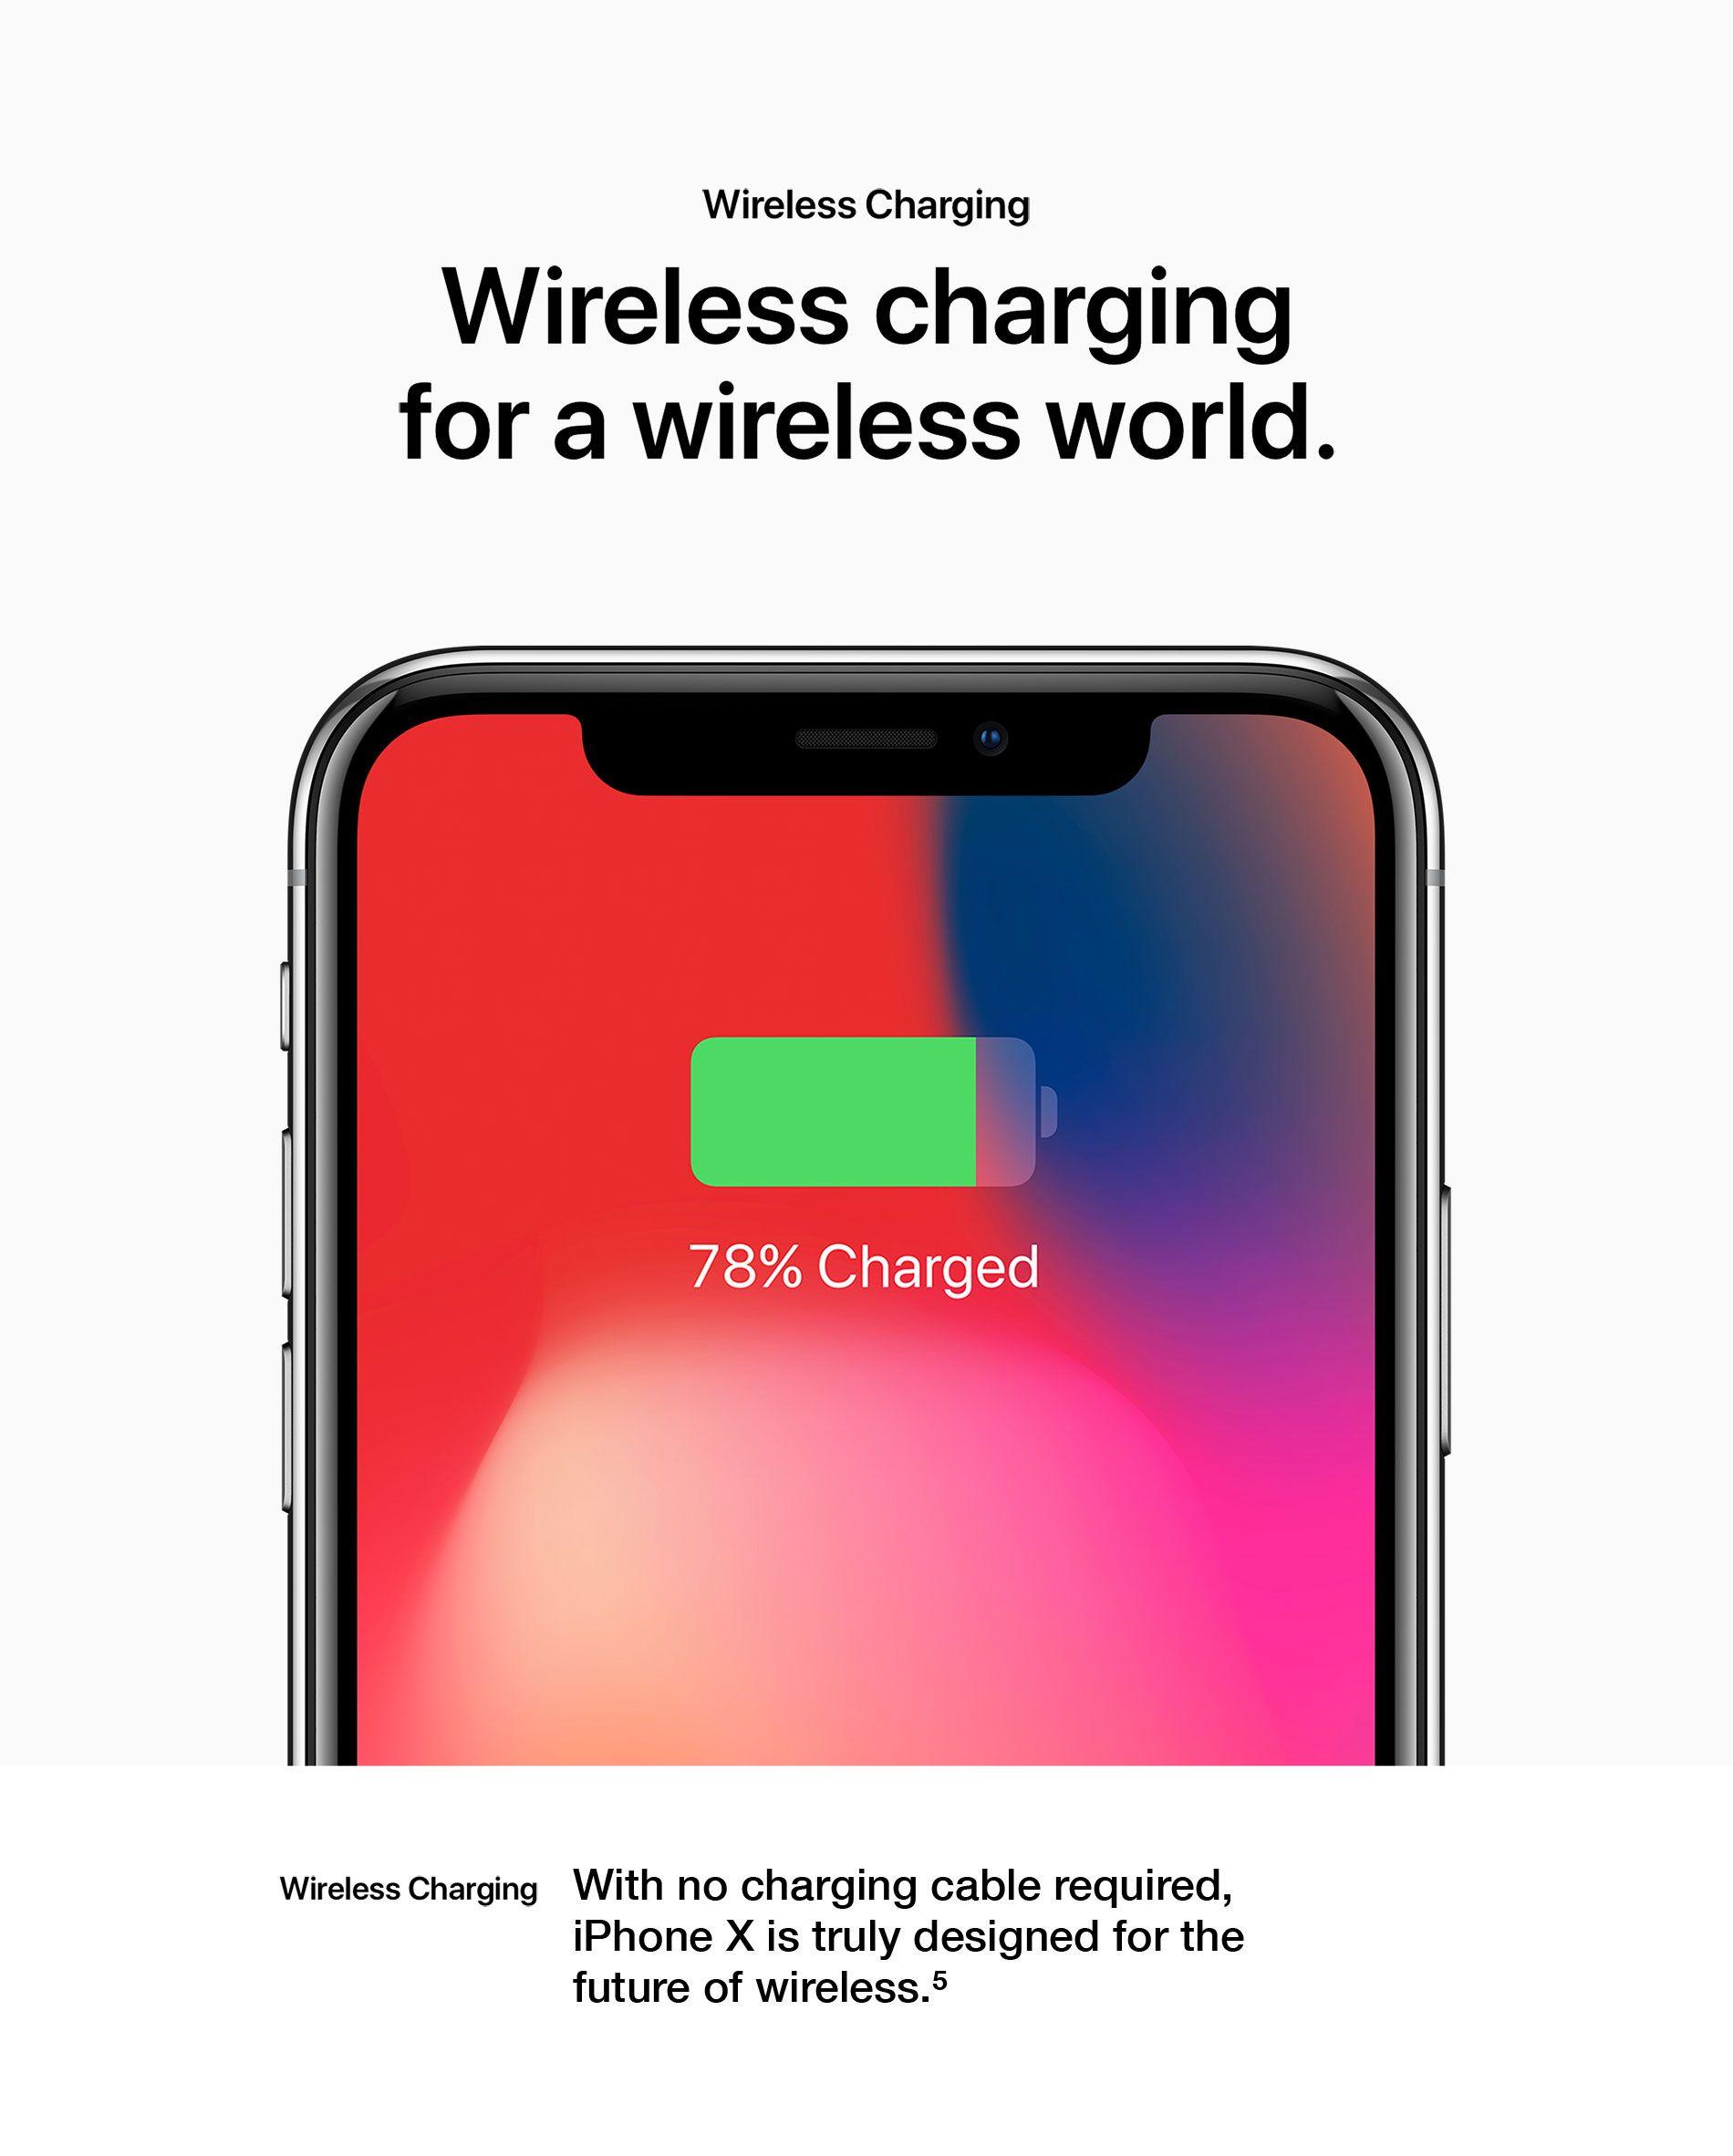 Wireless Charging - Wireless charging for a wireless world.